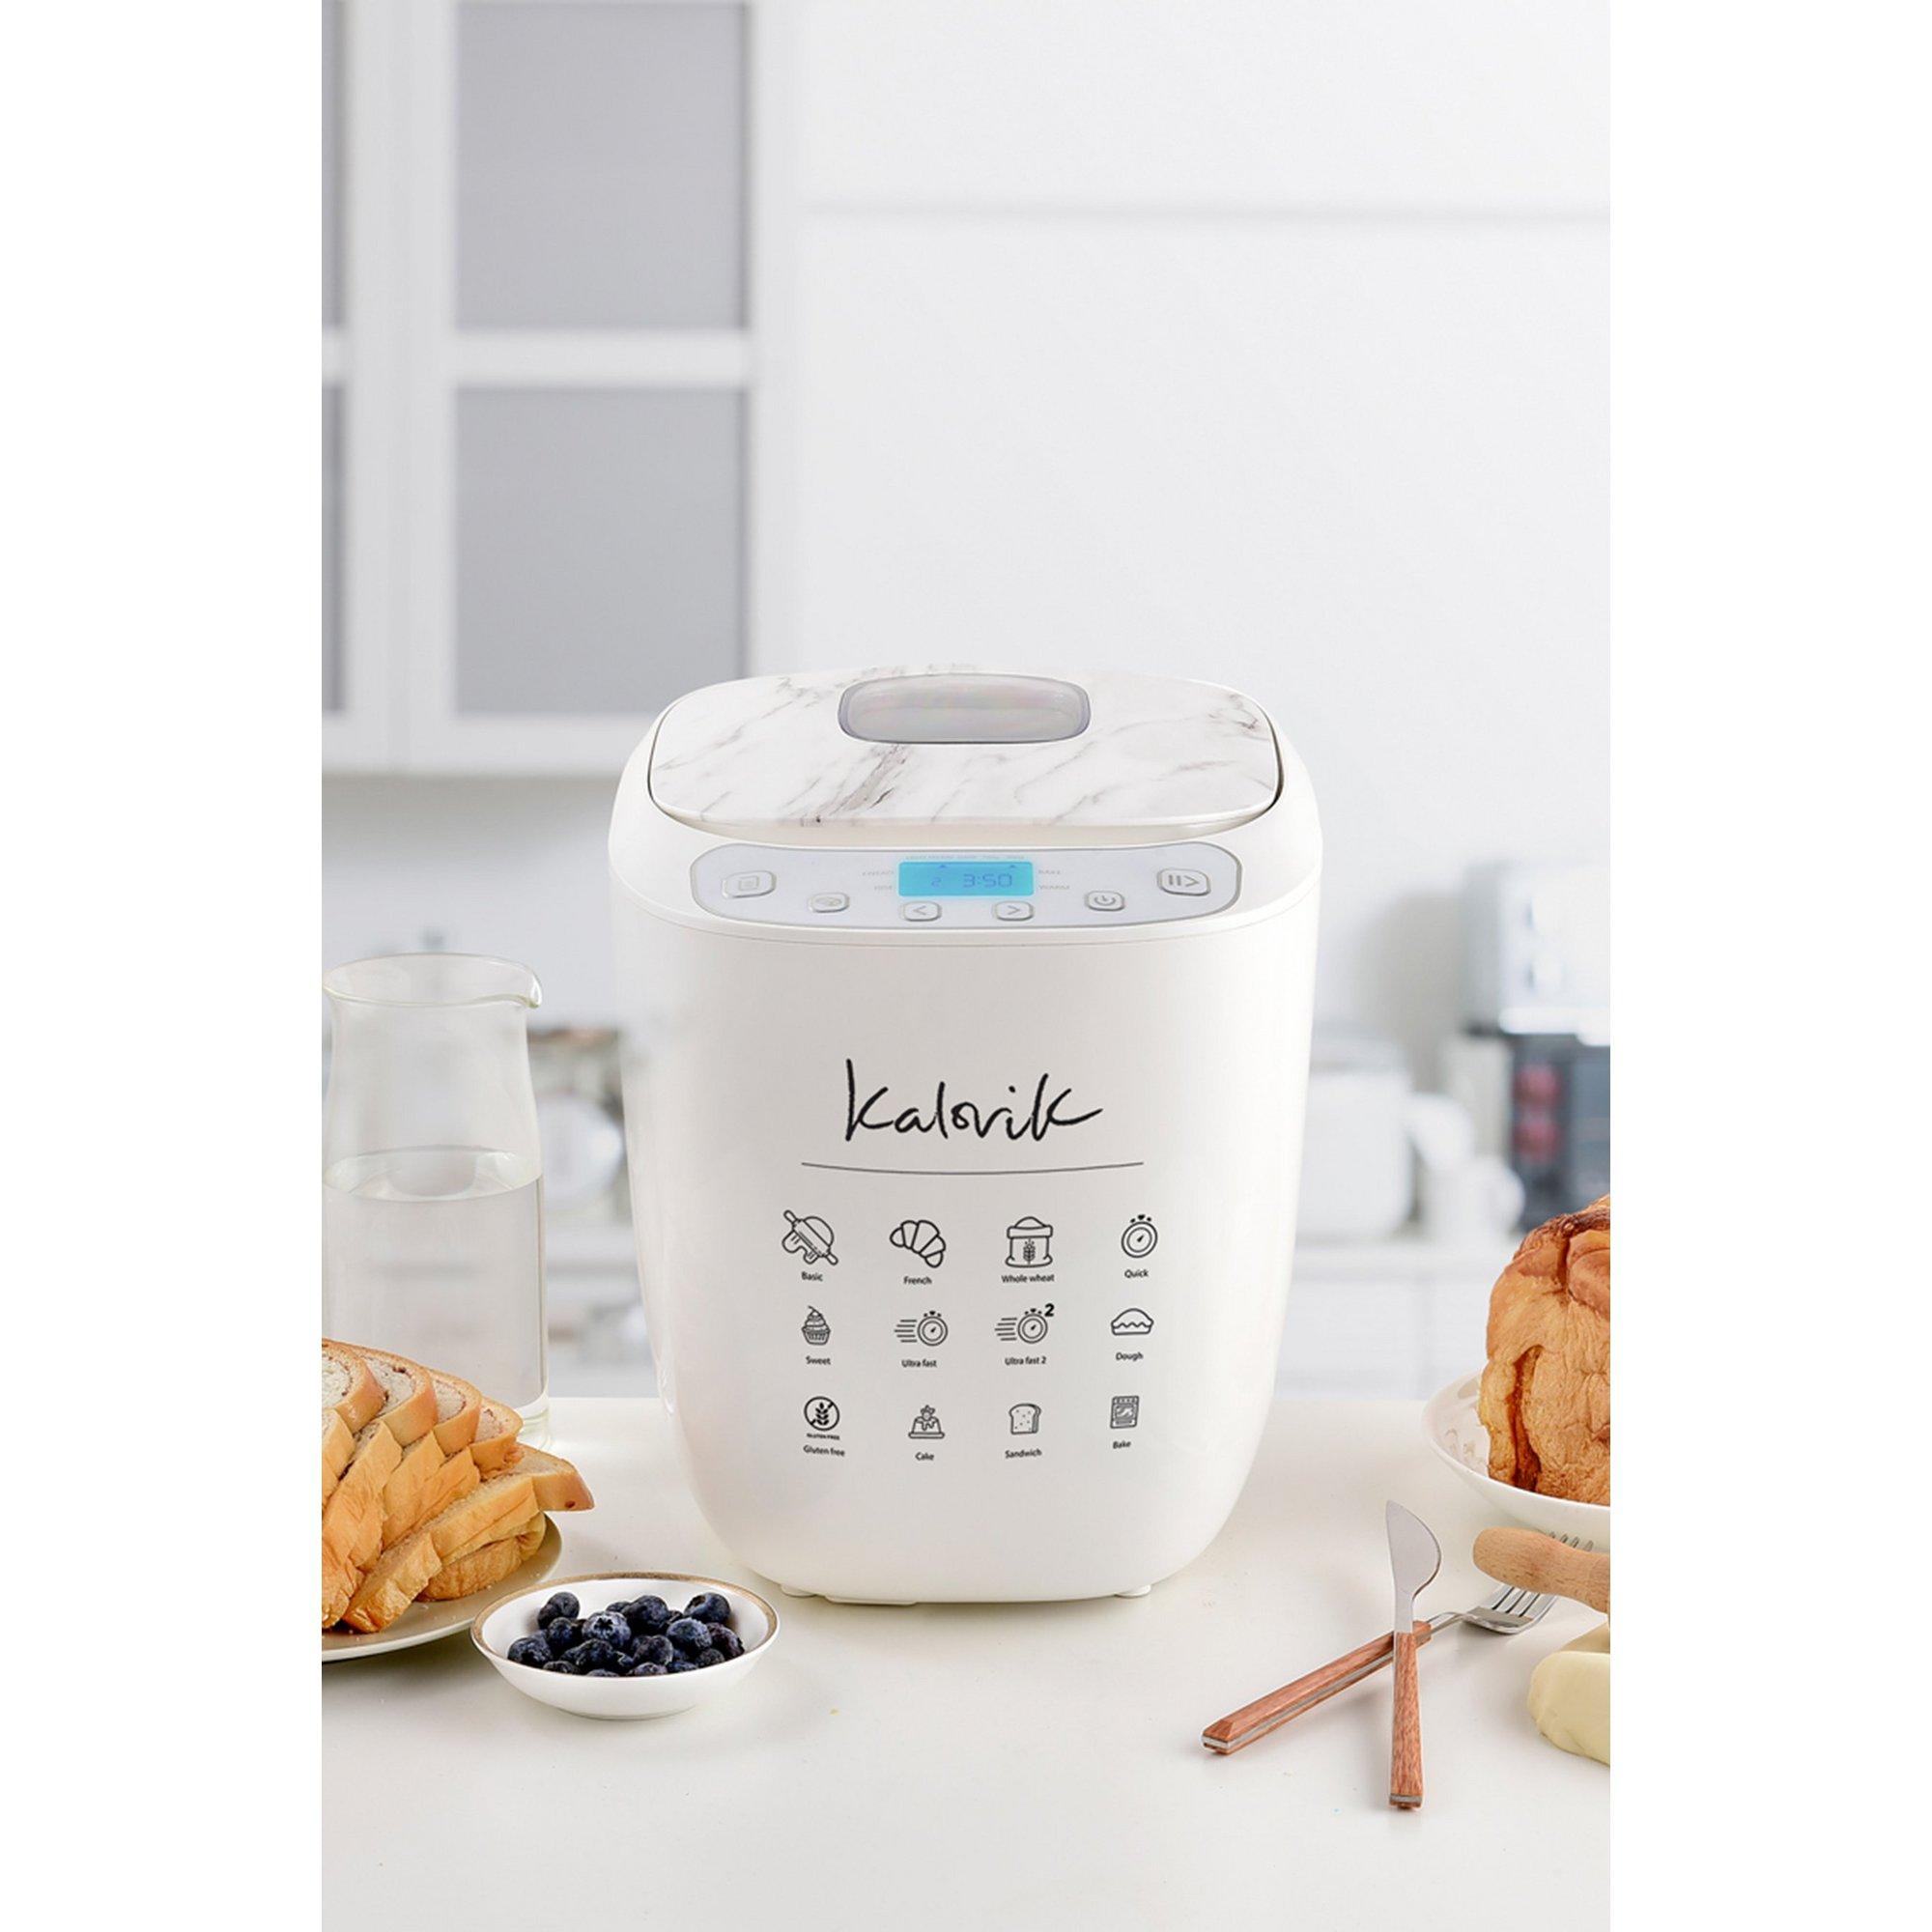 Image of Kalorik 2LB Marble Accent Breadmaker